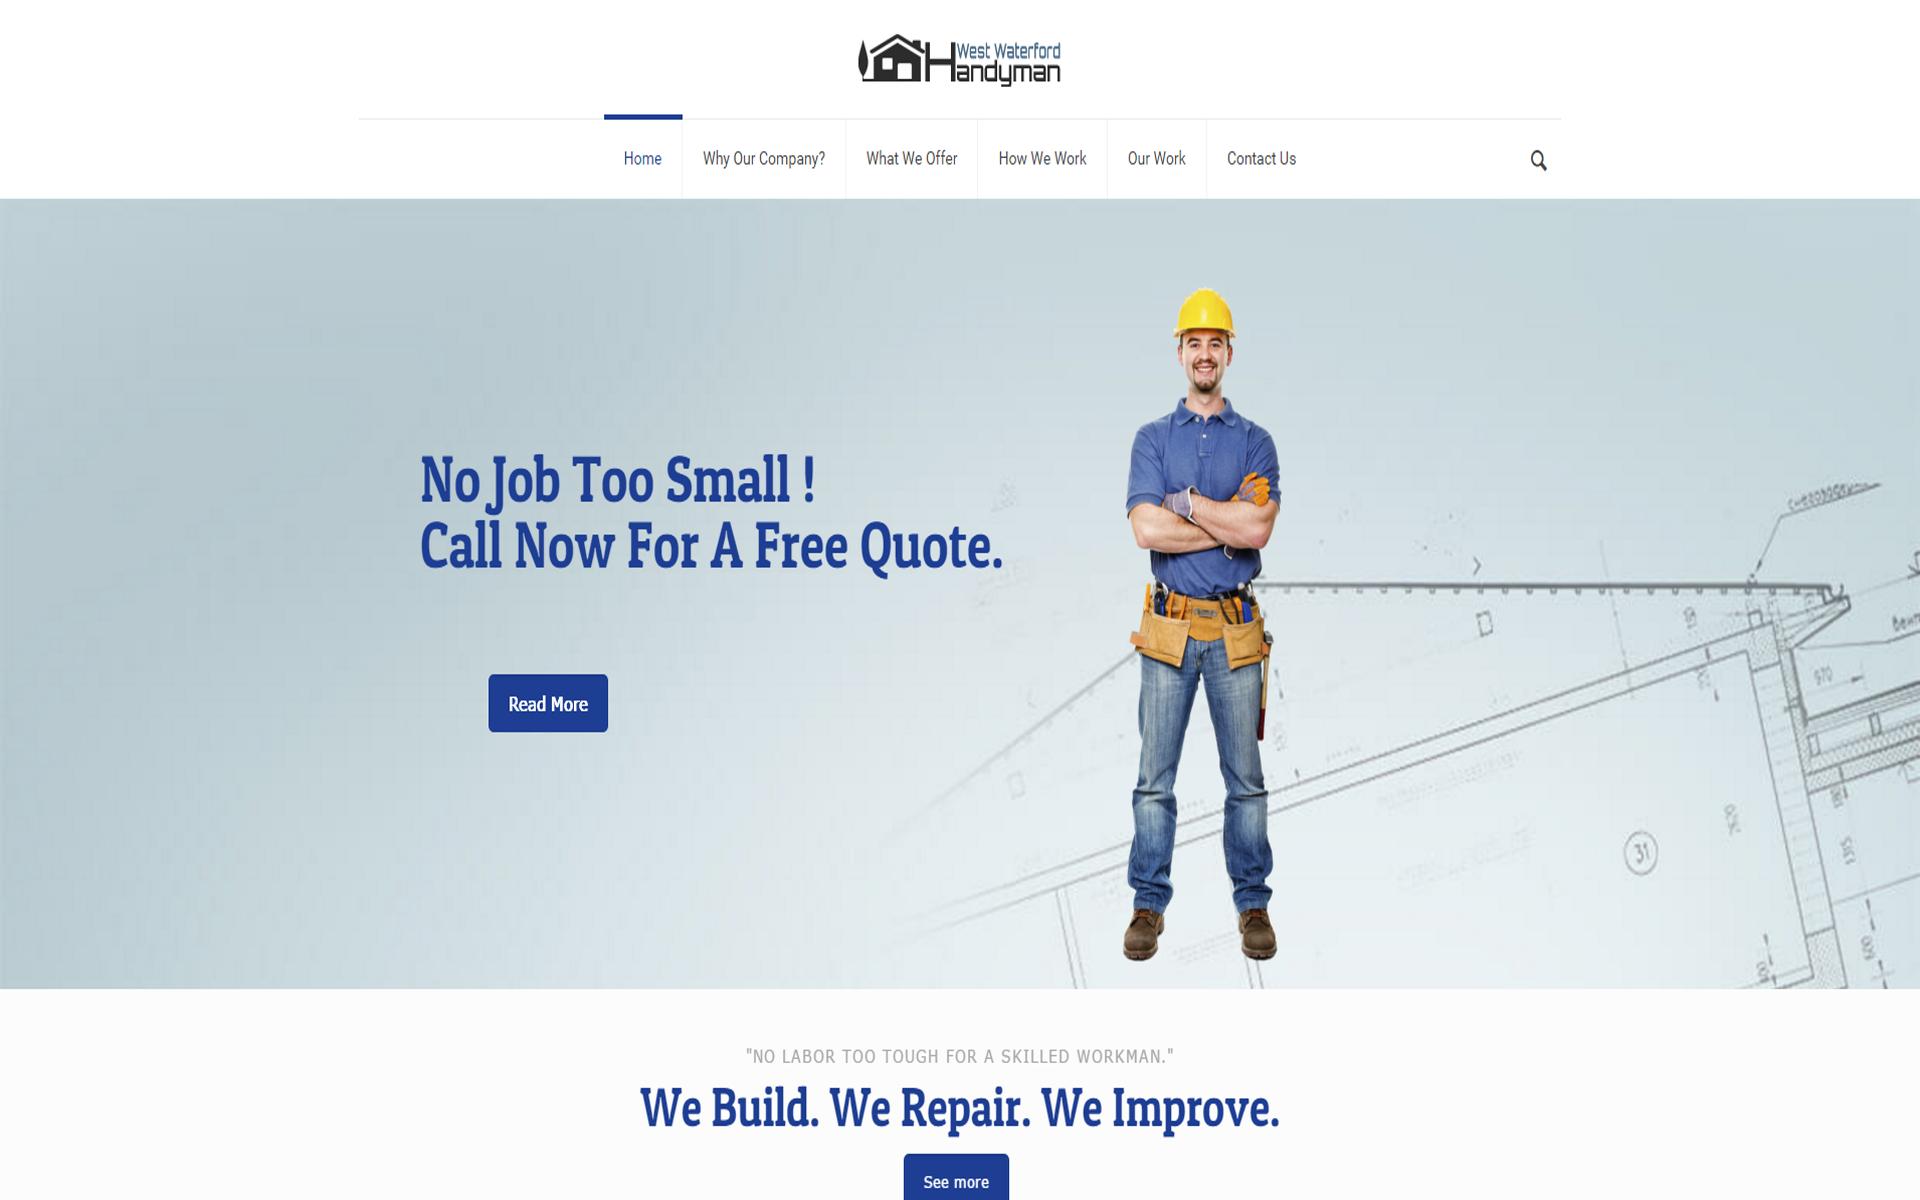 West Waterford Handyman Web Design Twapp Media